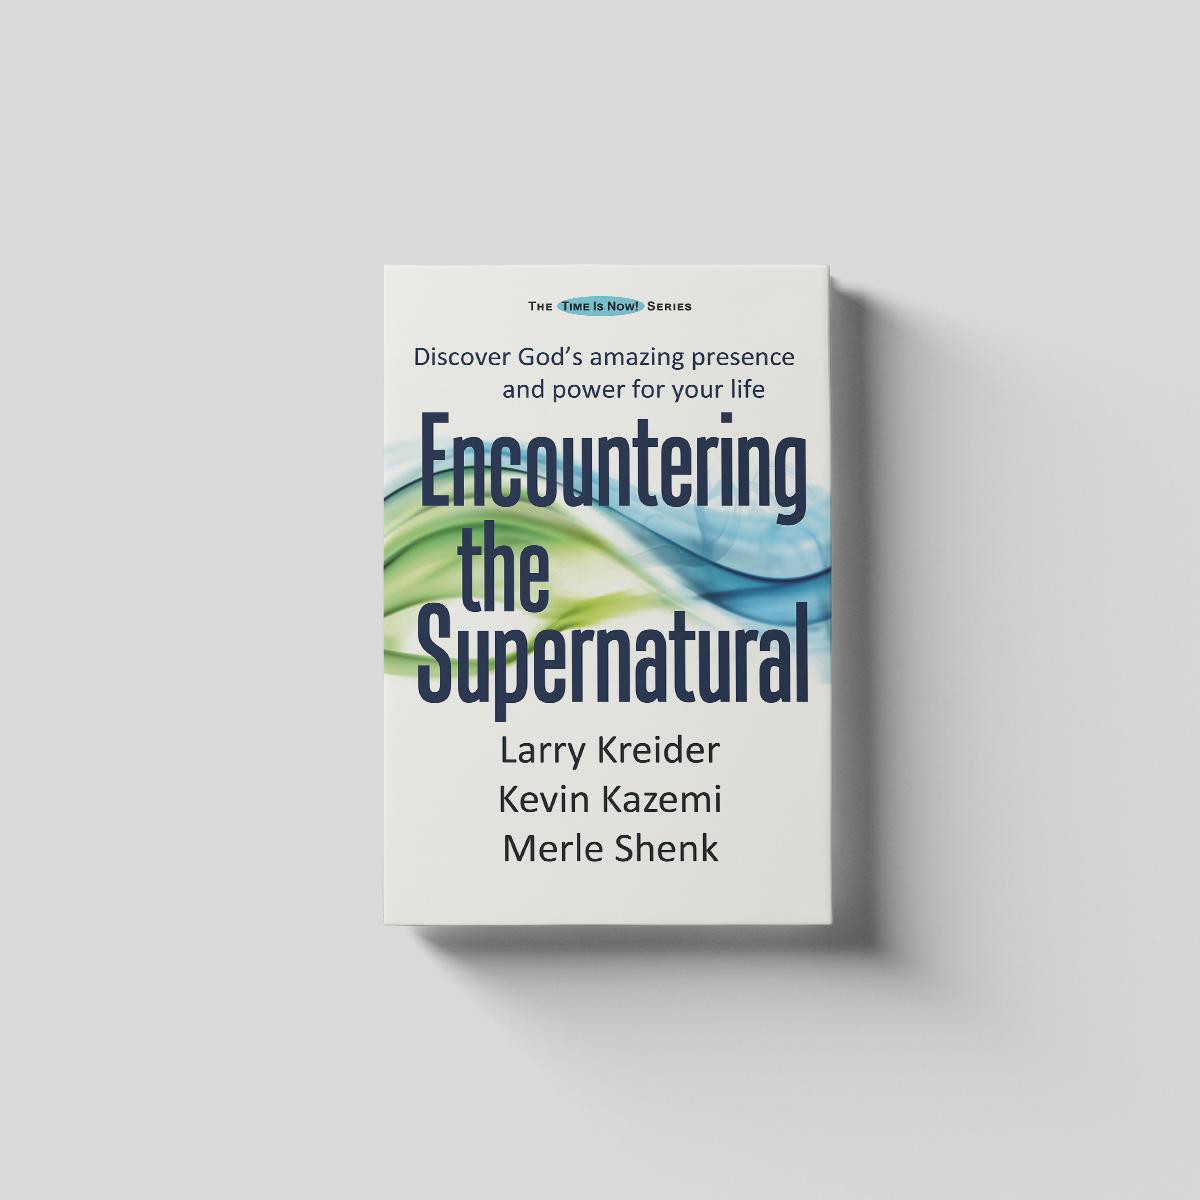 Encountering the Supernatural